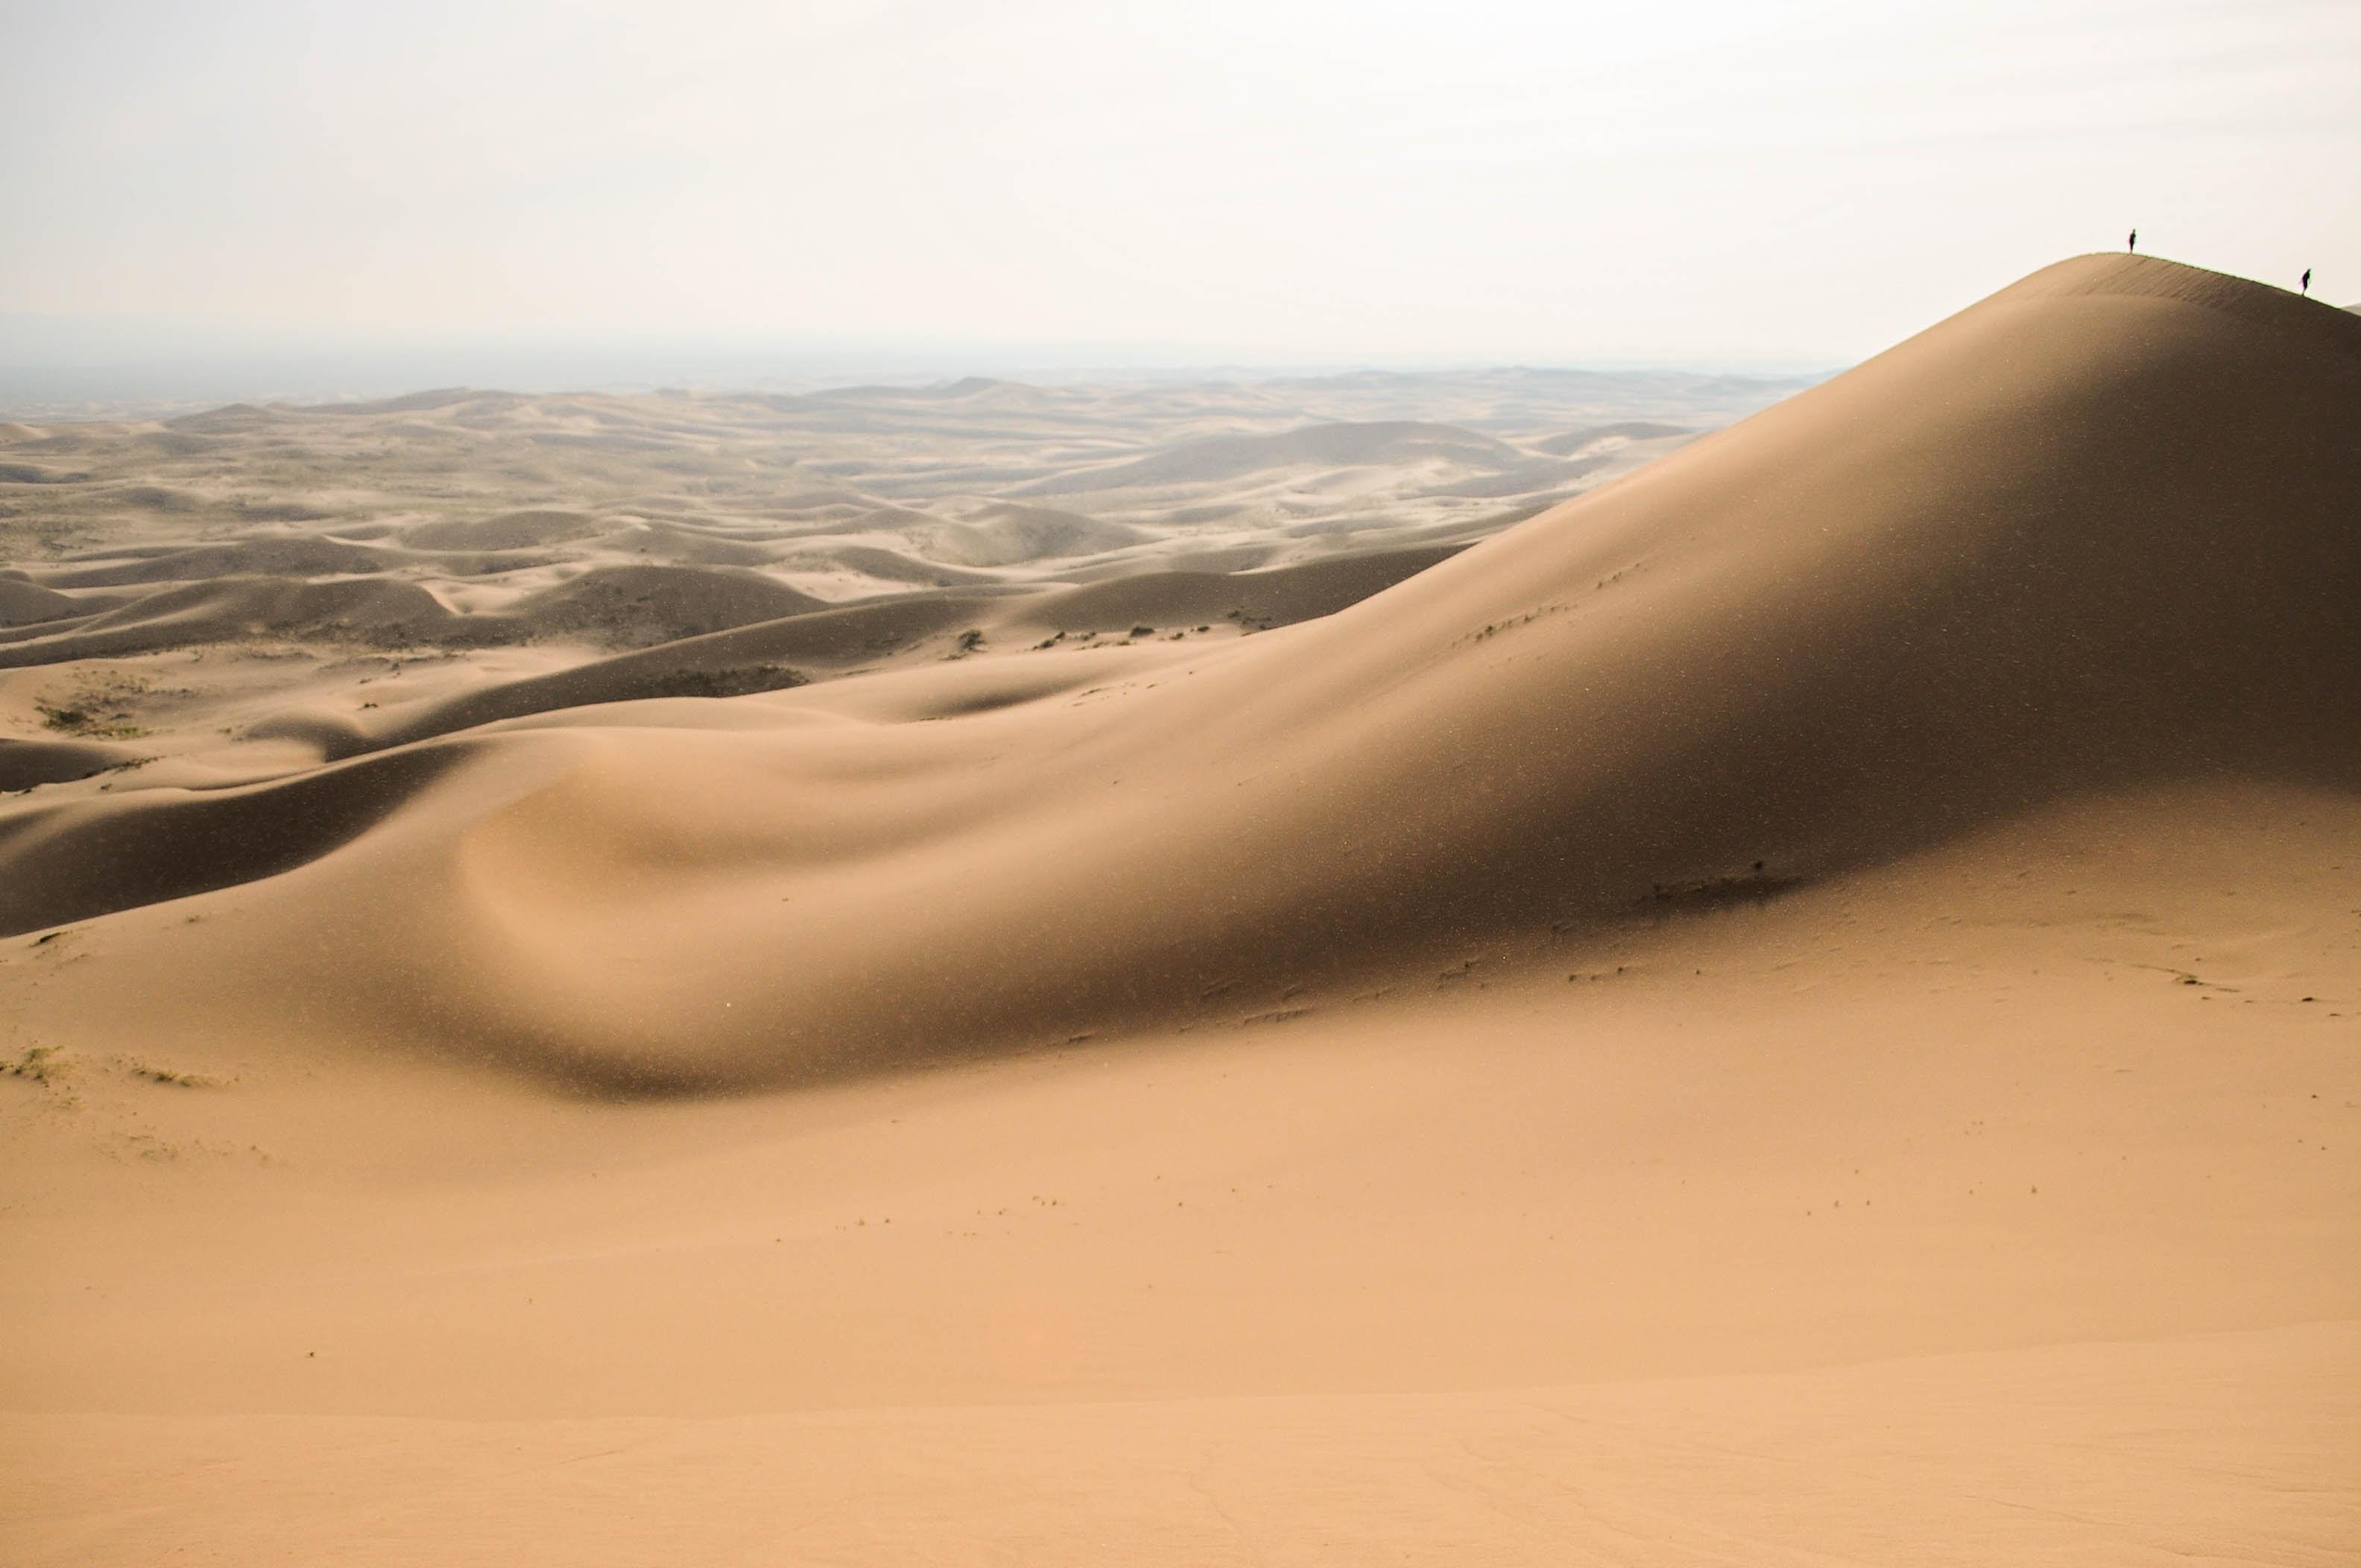 Walking on the sandy ridges of the desert in Khongoryn Els